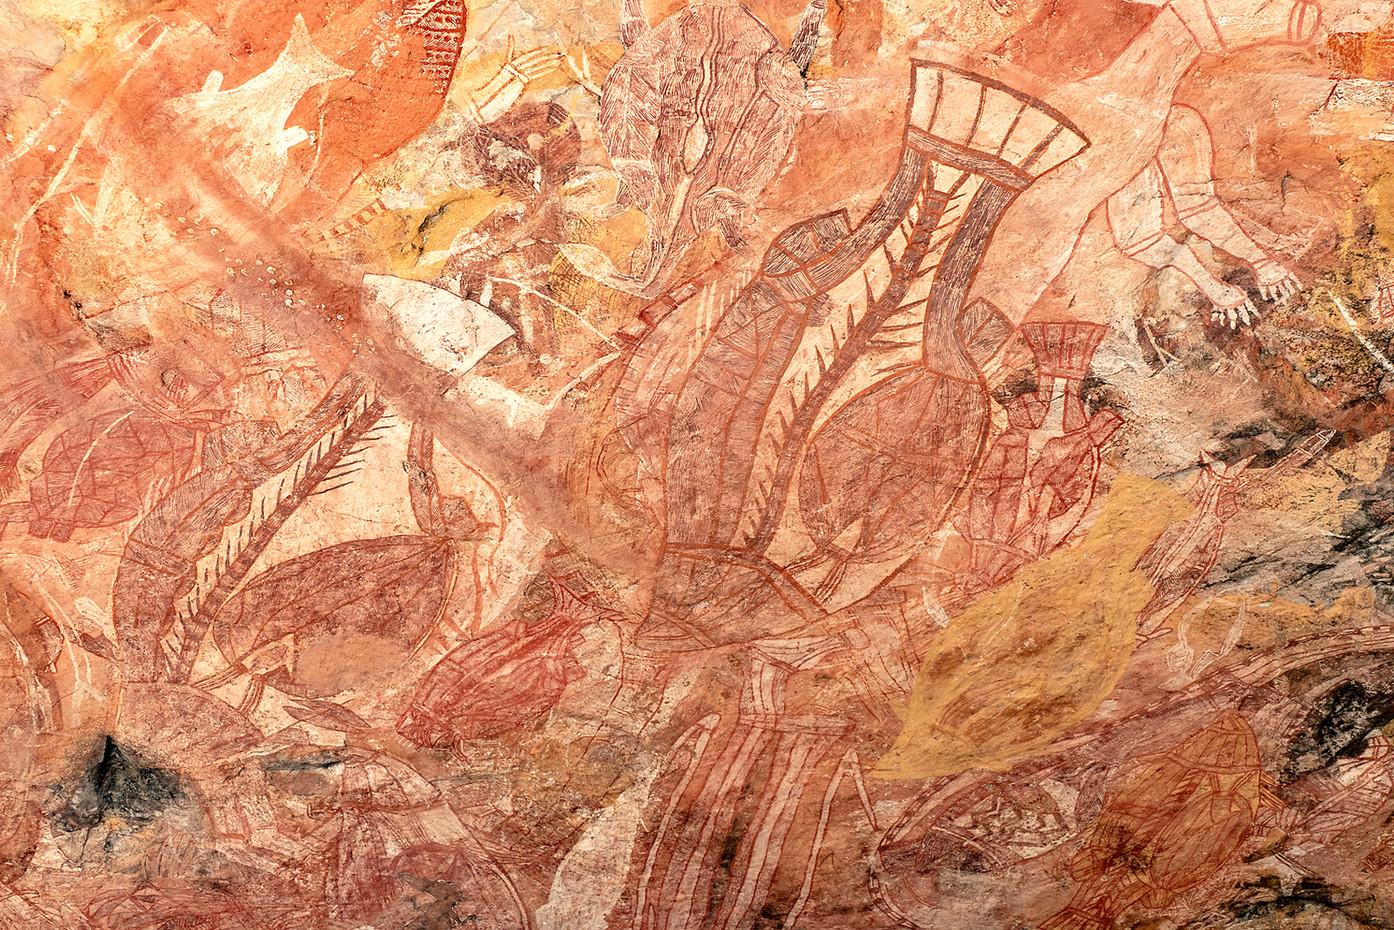 Aboriginal rock art in Arnham Land, Australia